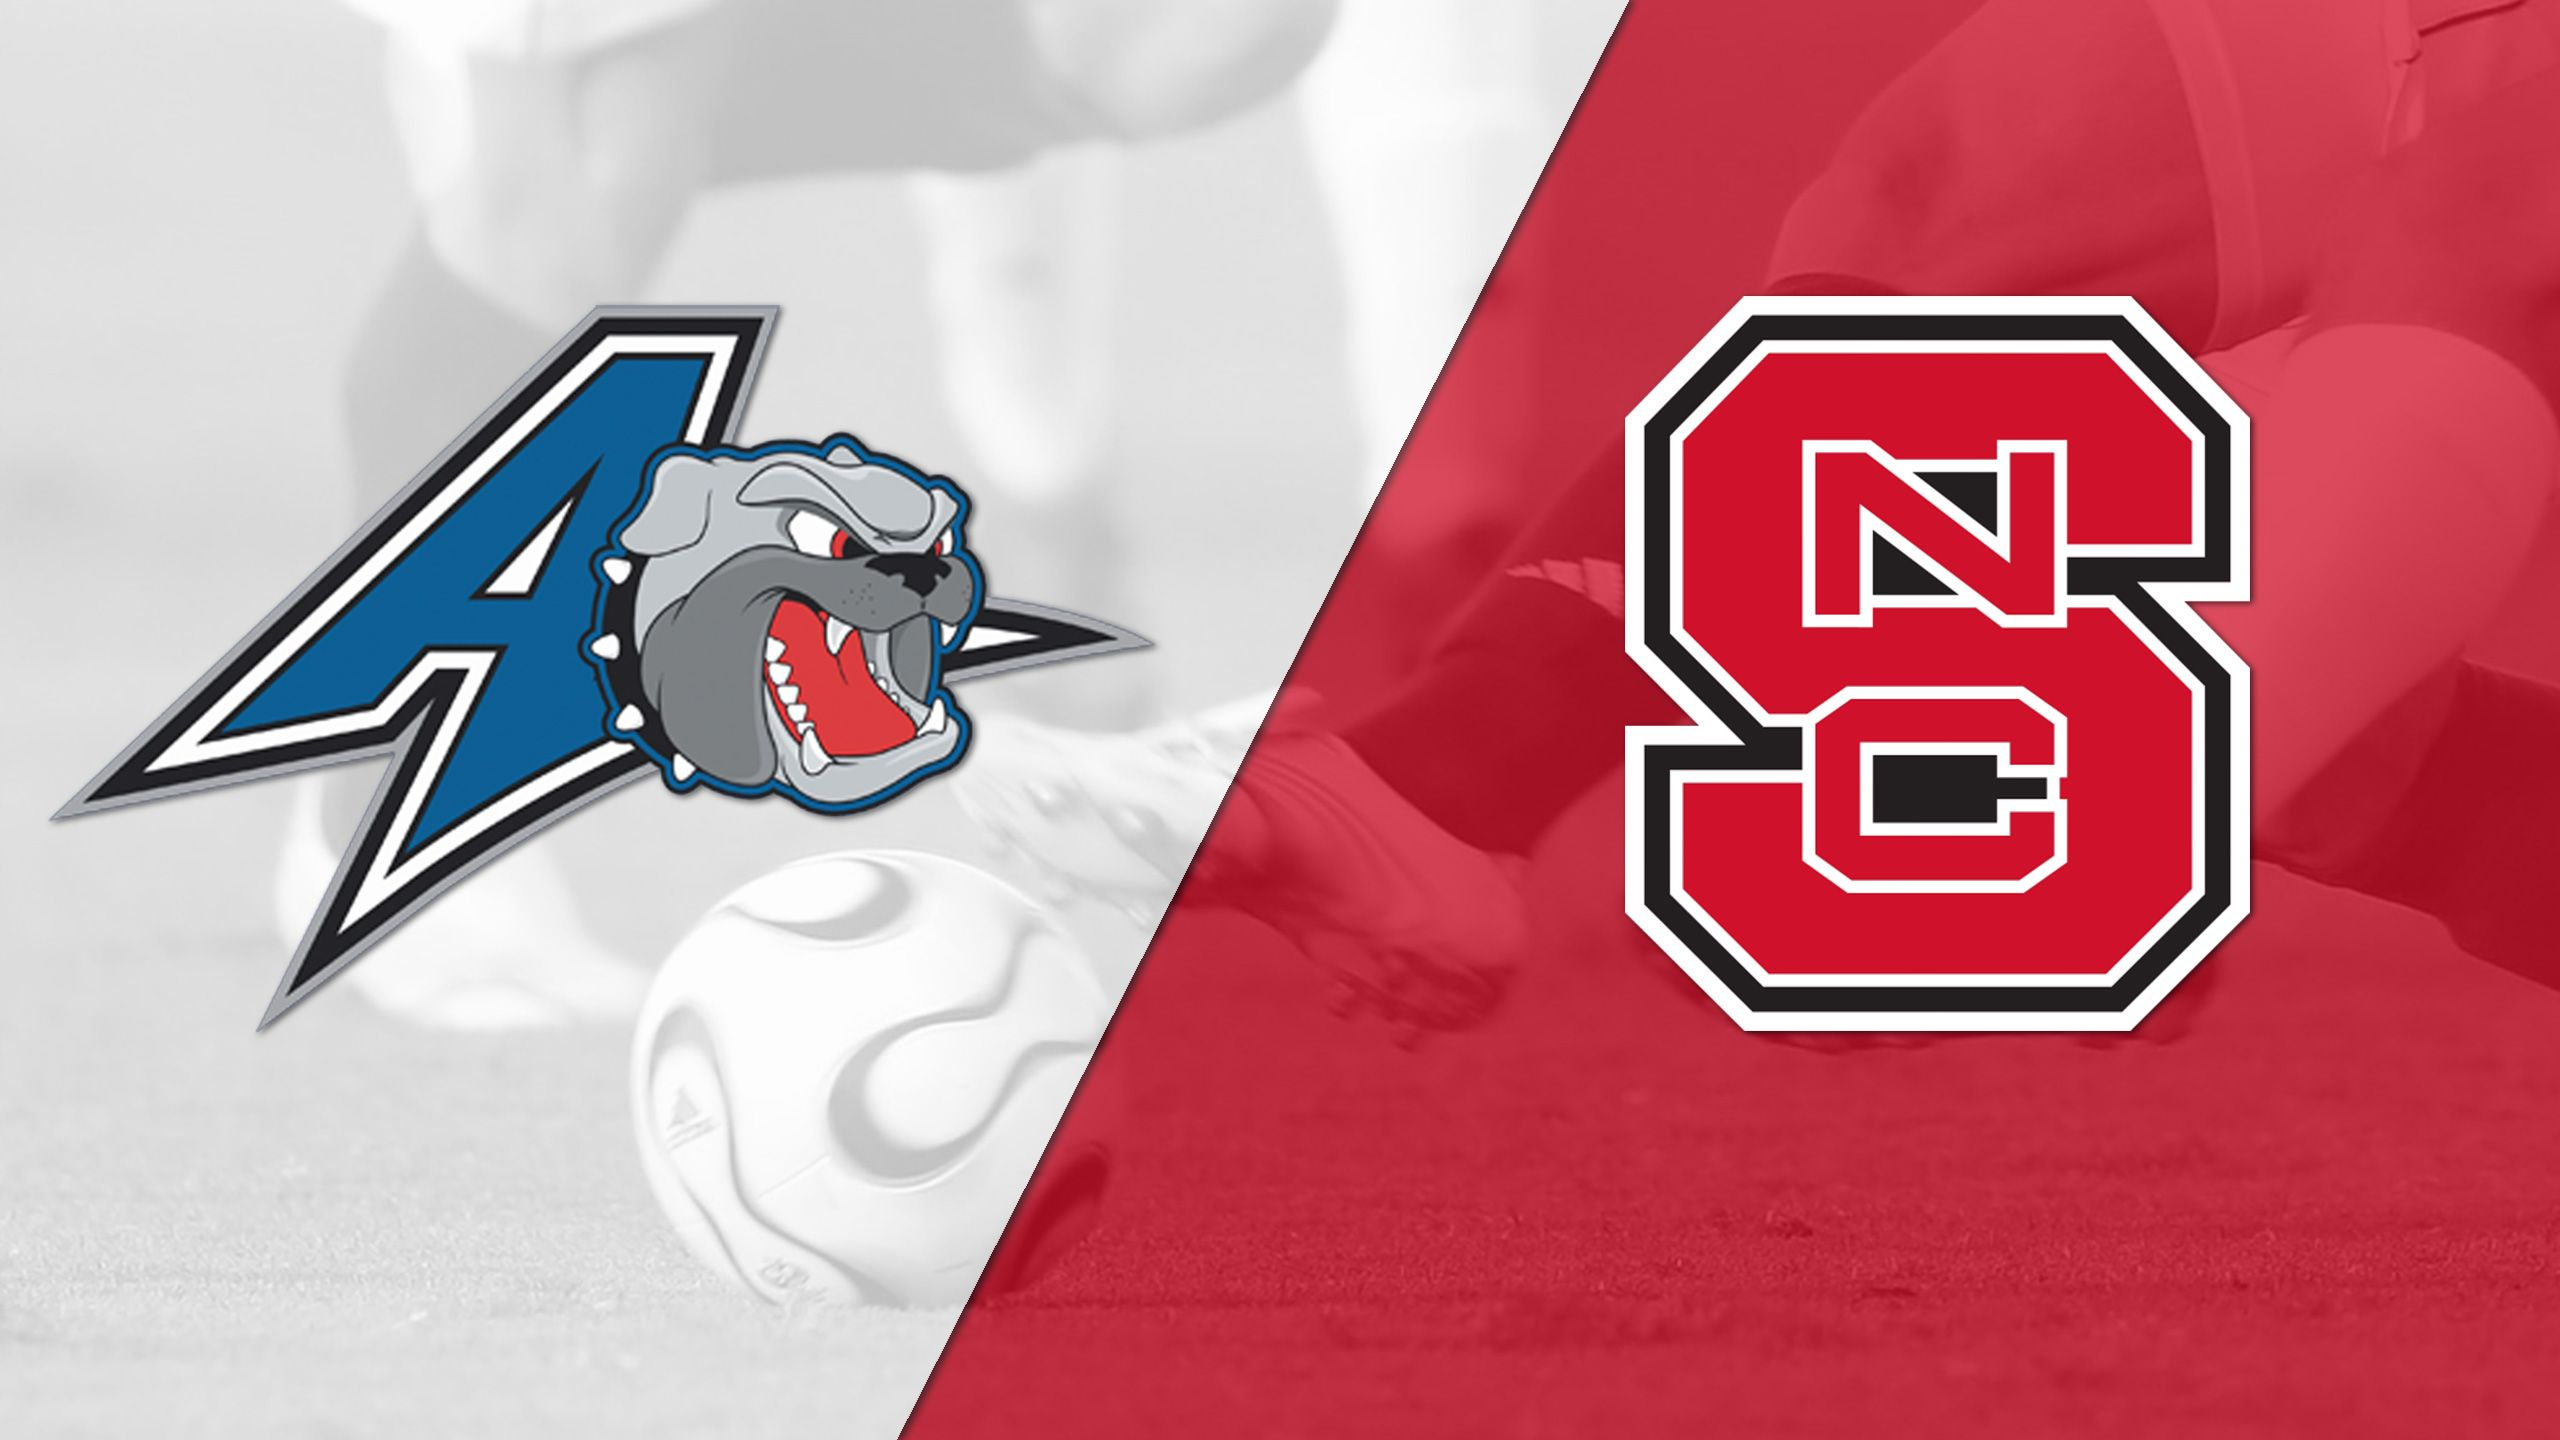 UNC-Asheville vs. NC State (M Soccer)